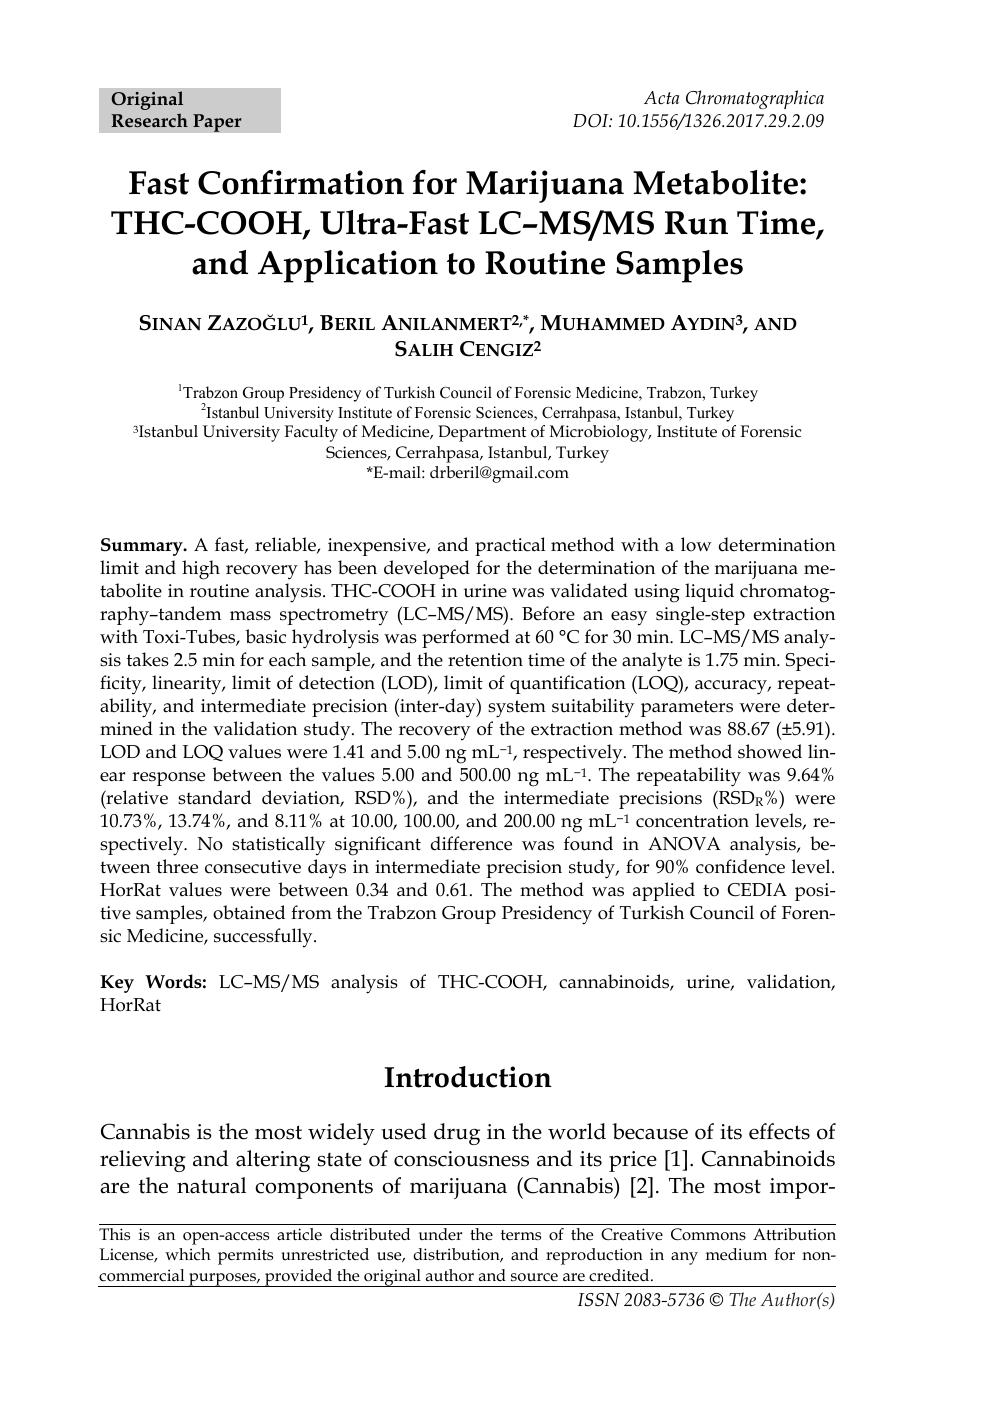 Forensic science drug research paper marijuana